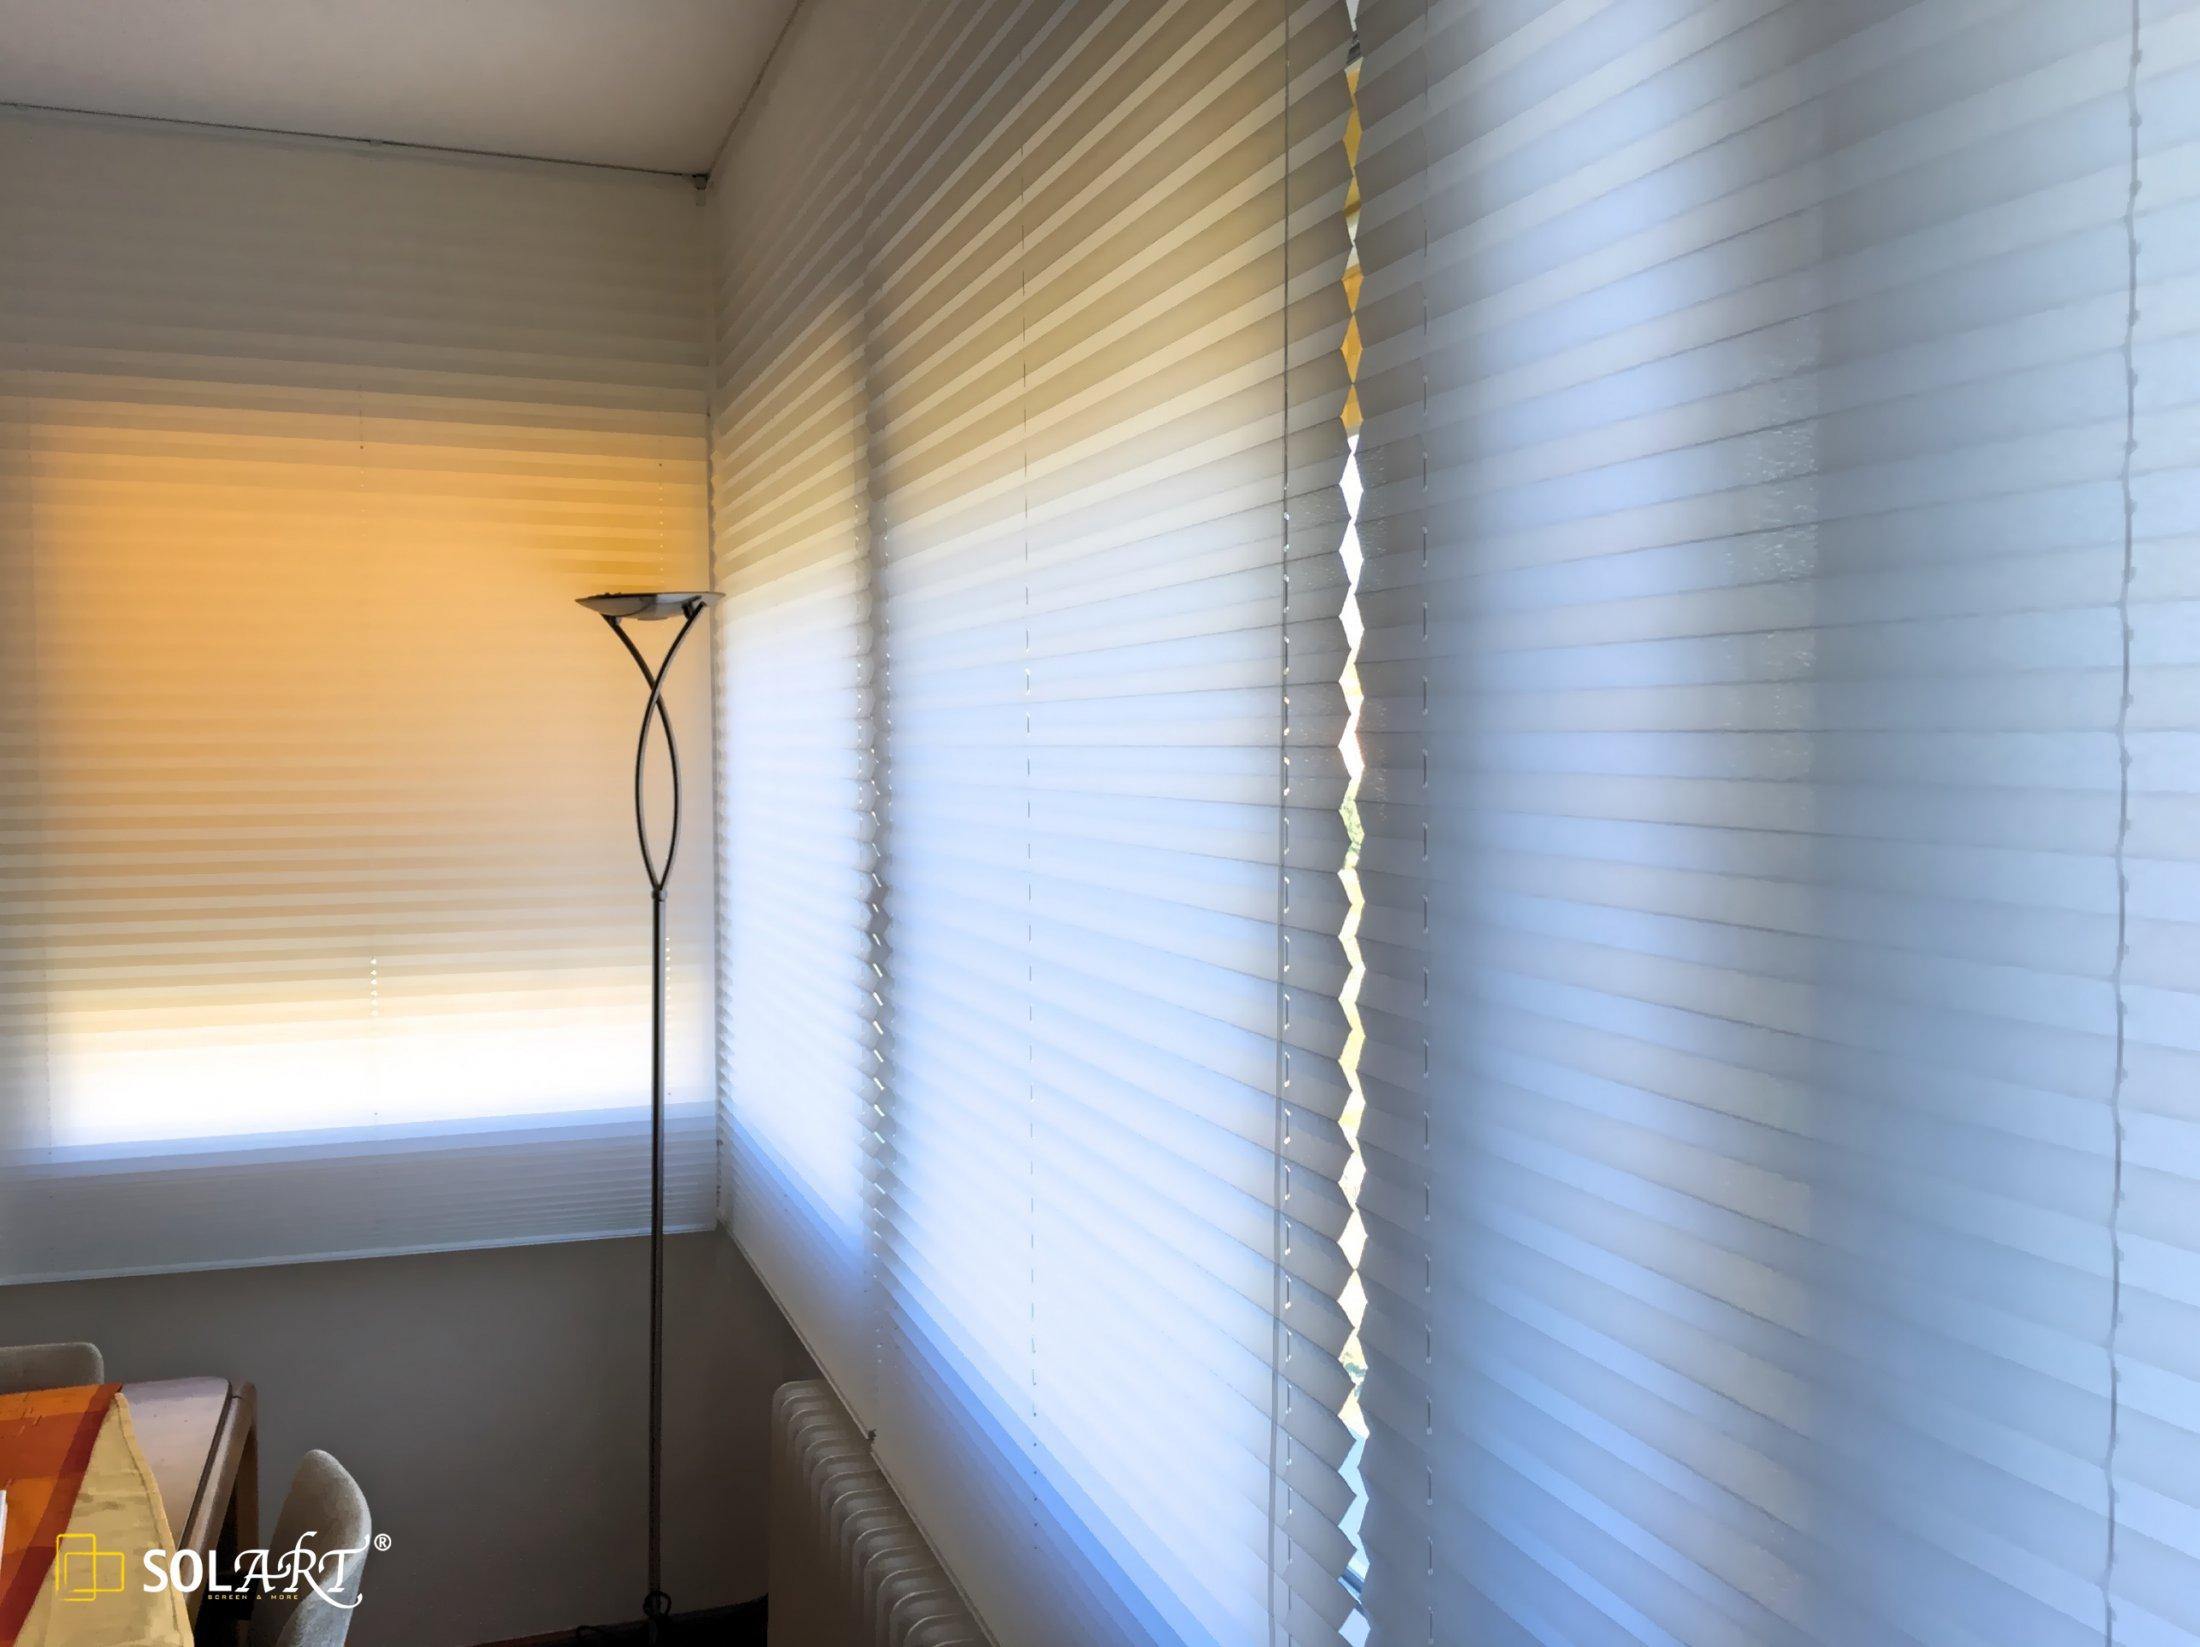 Cortinas plisadas solart 57 solart - Comprar cortinas barcelona ...